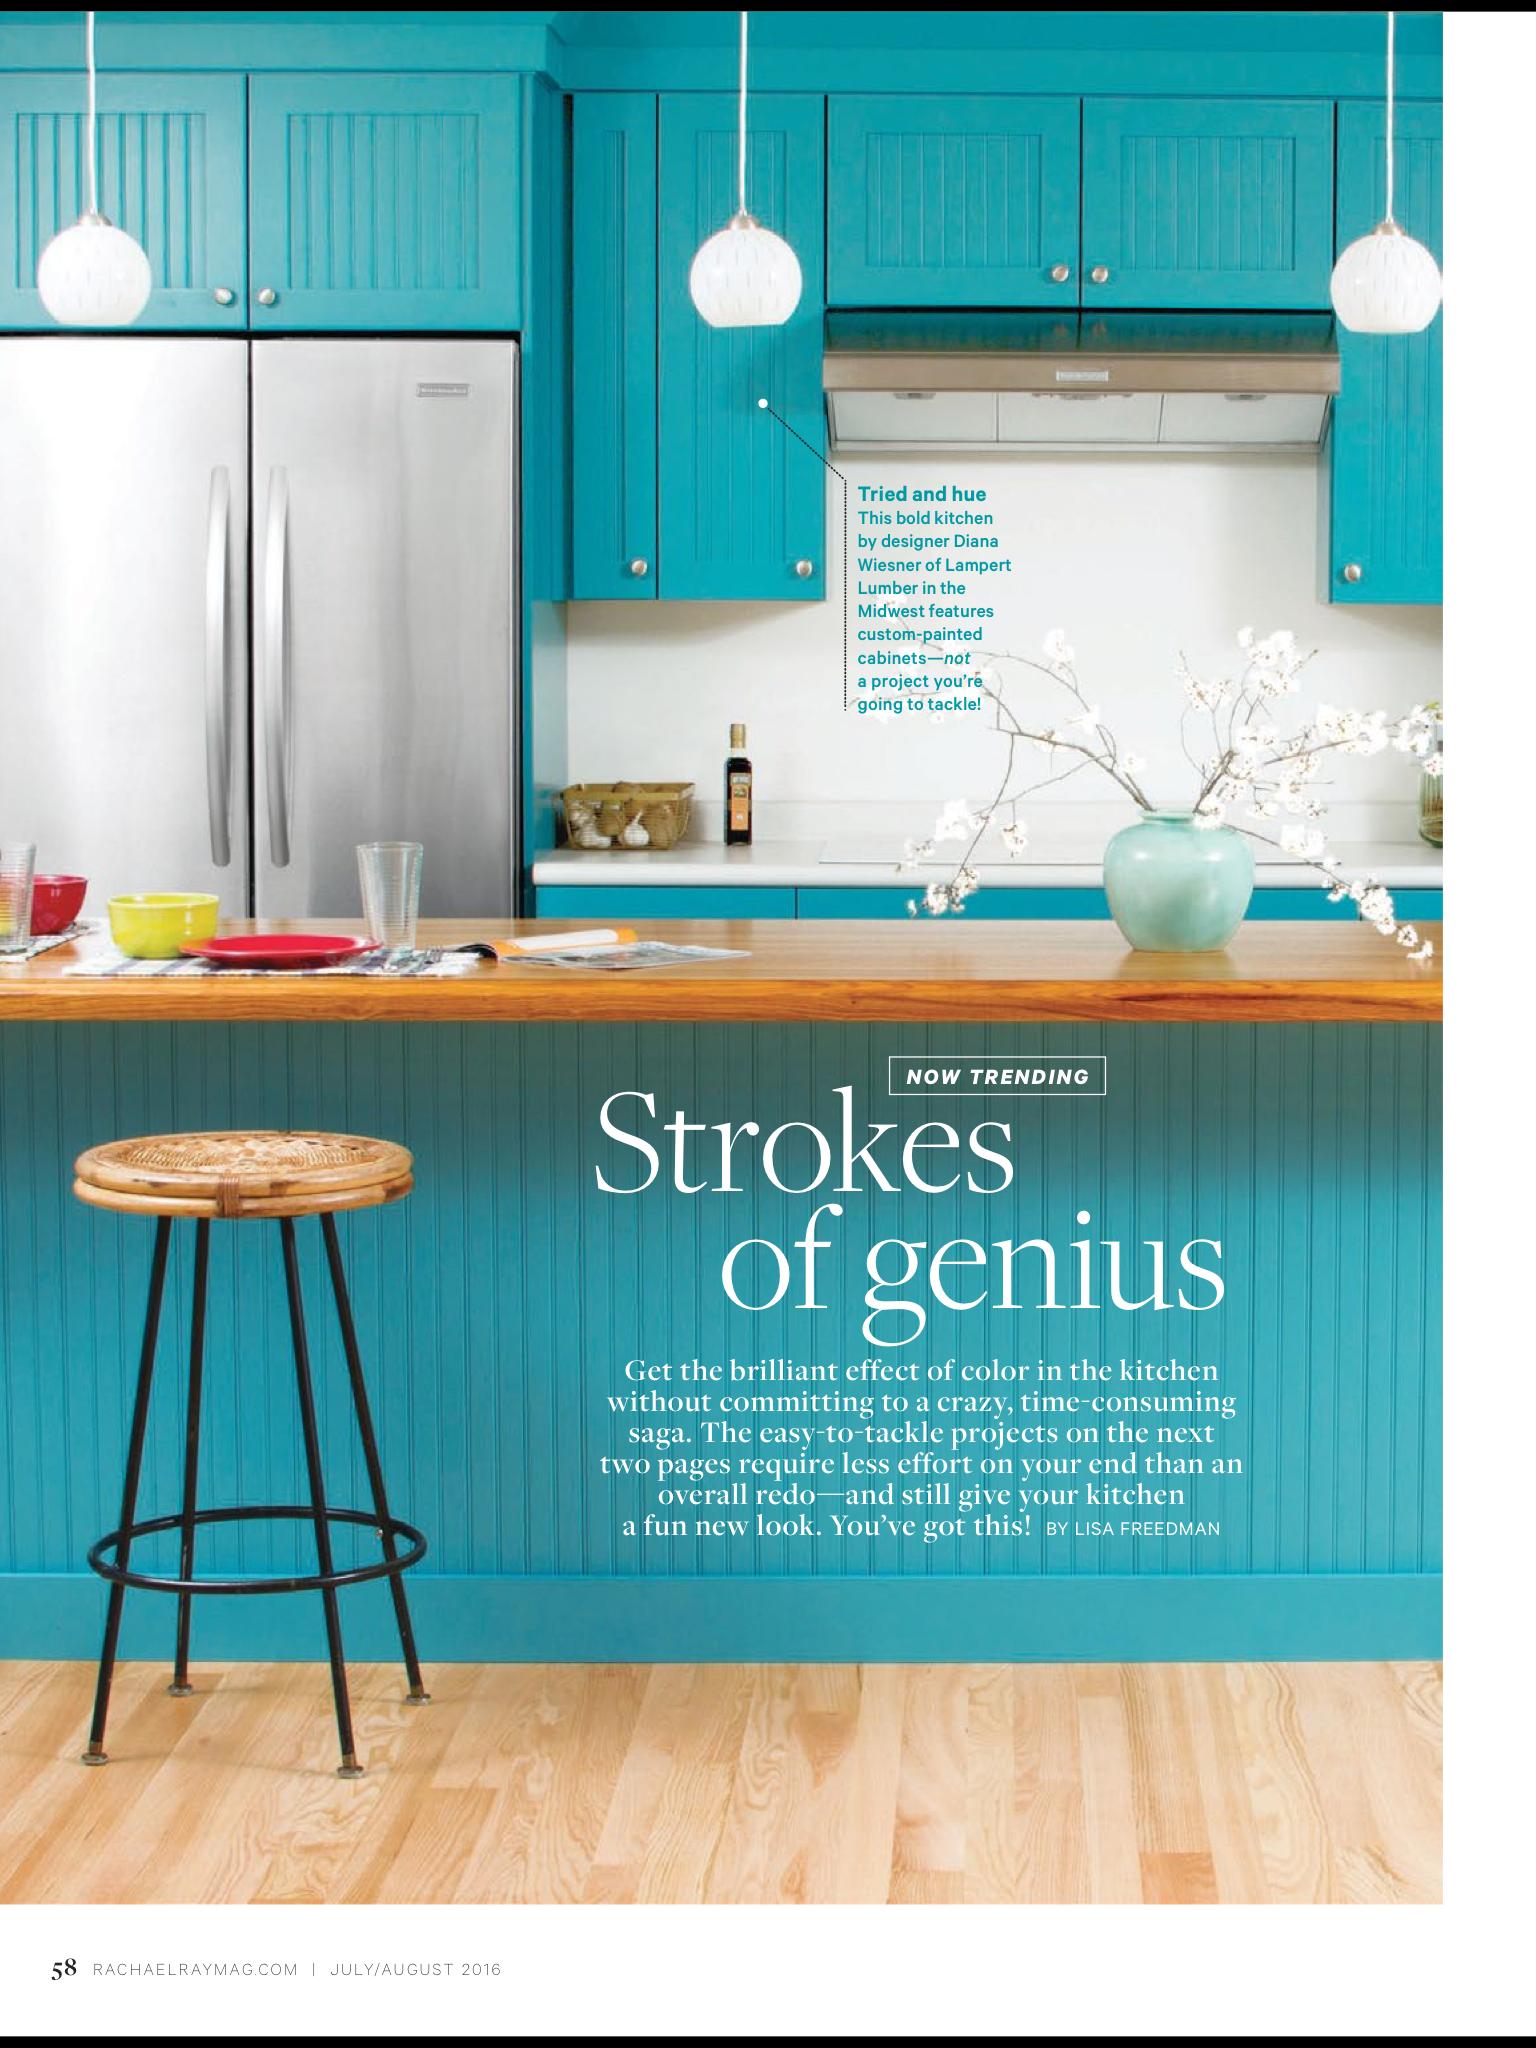 Pin by Susanna Pope on KW Home | Fresh kitchen, Kitchen ...